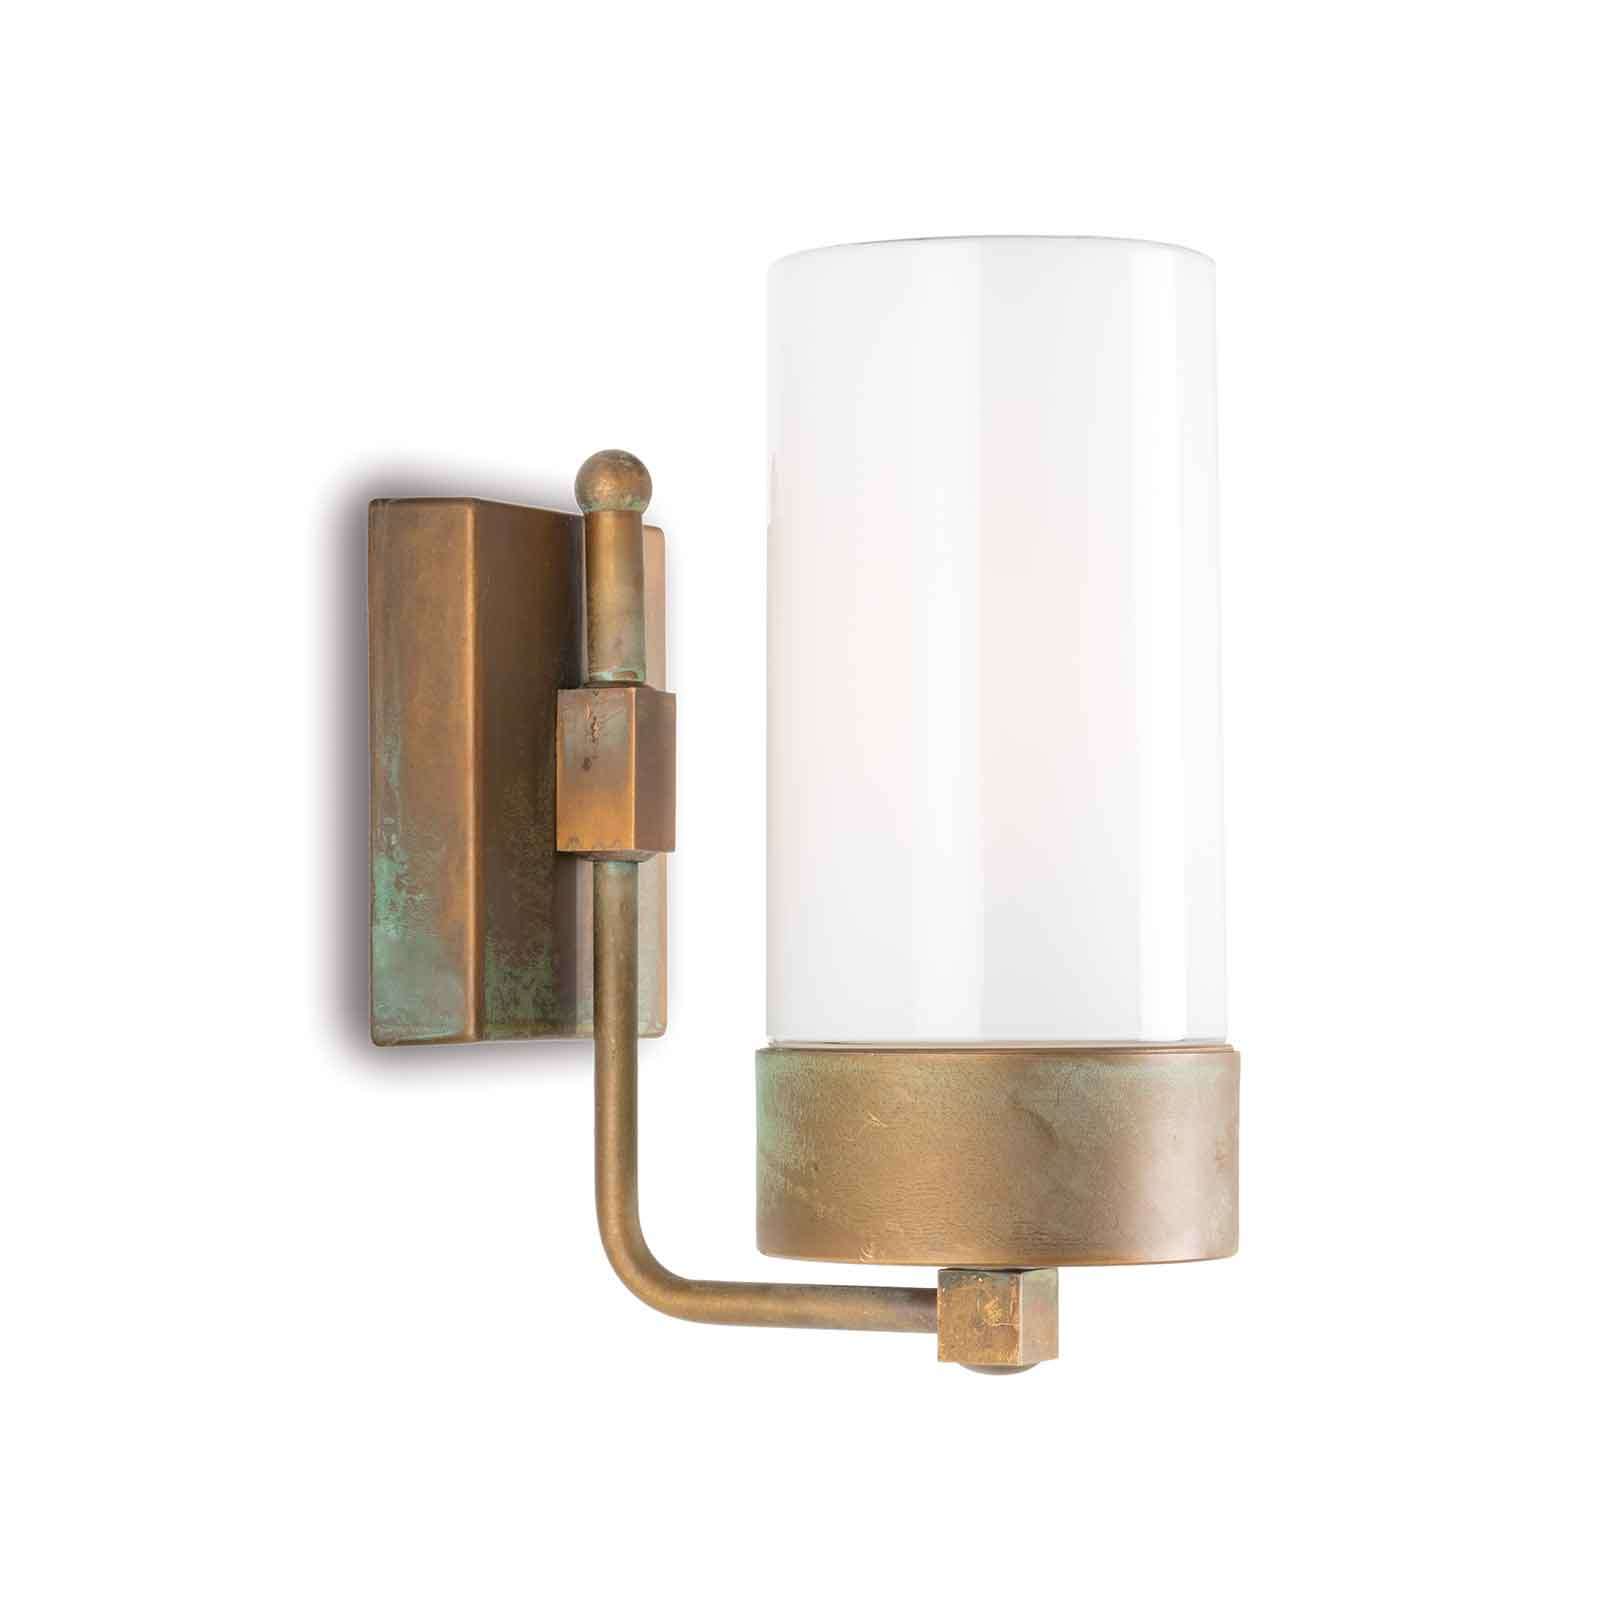 Buitenwandlamp Silindar 3390, messing antiek/opaal